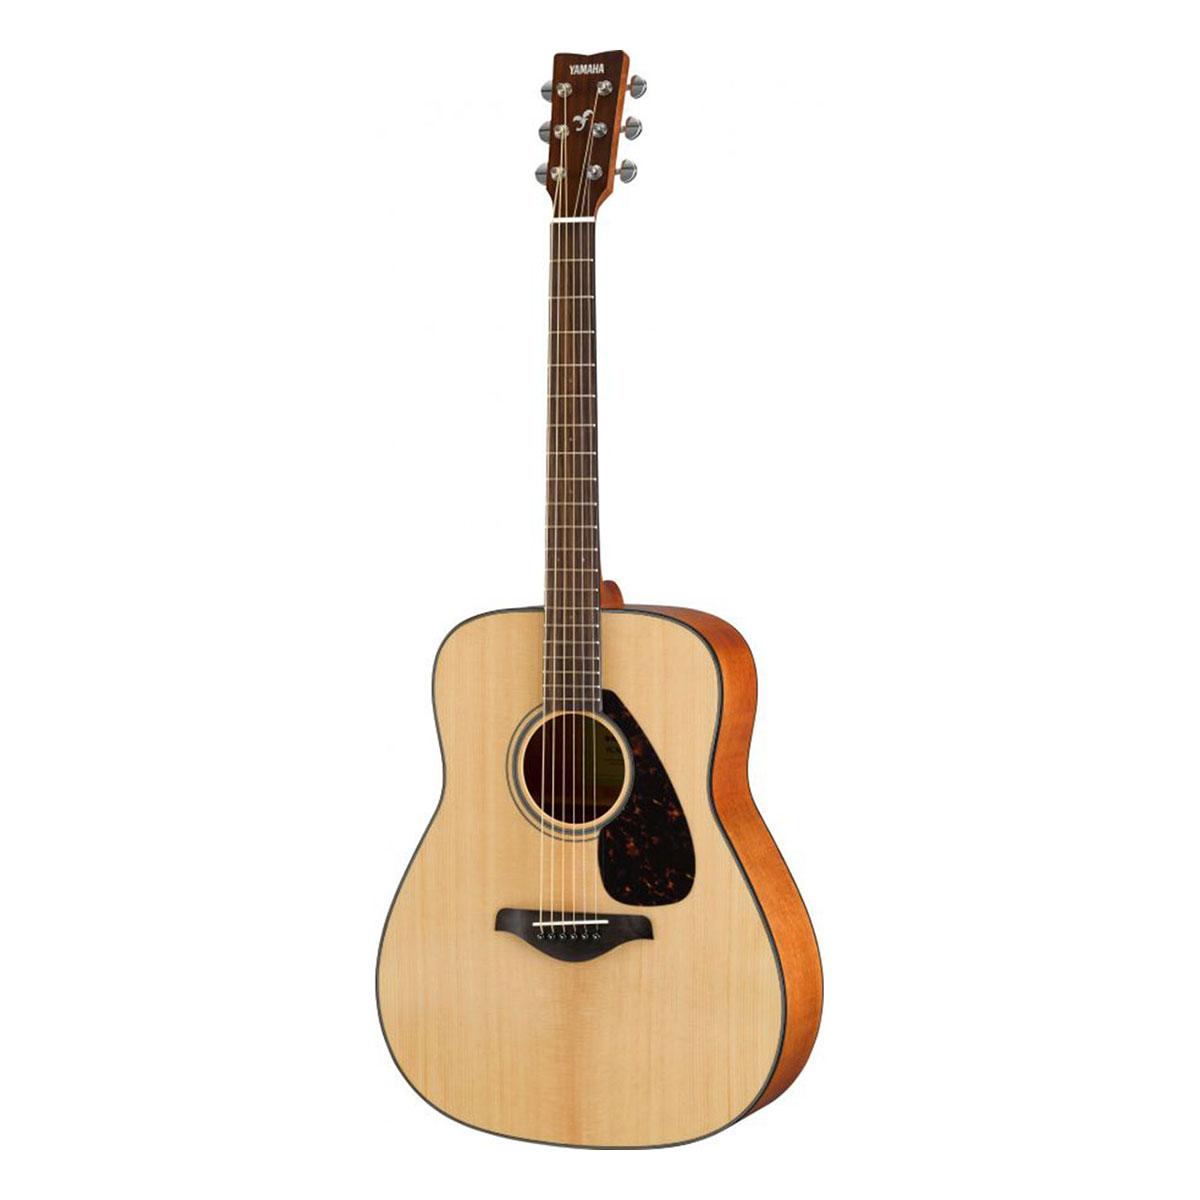 Yamaha - GFG800NT natural - guitare folk T